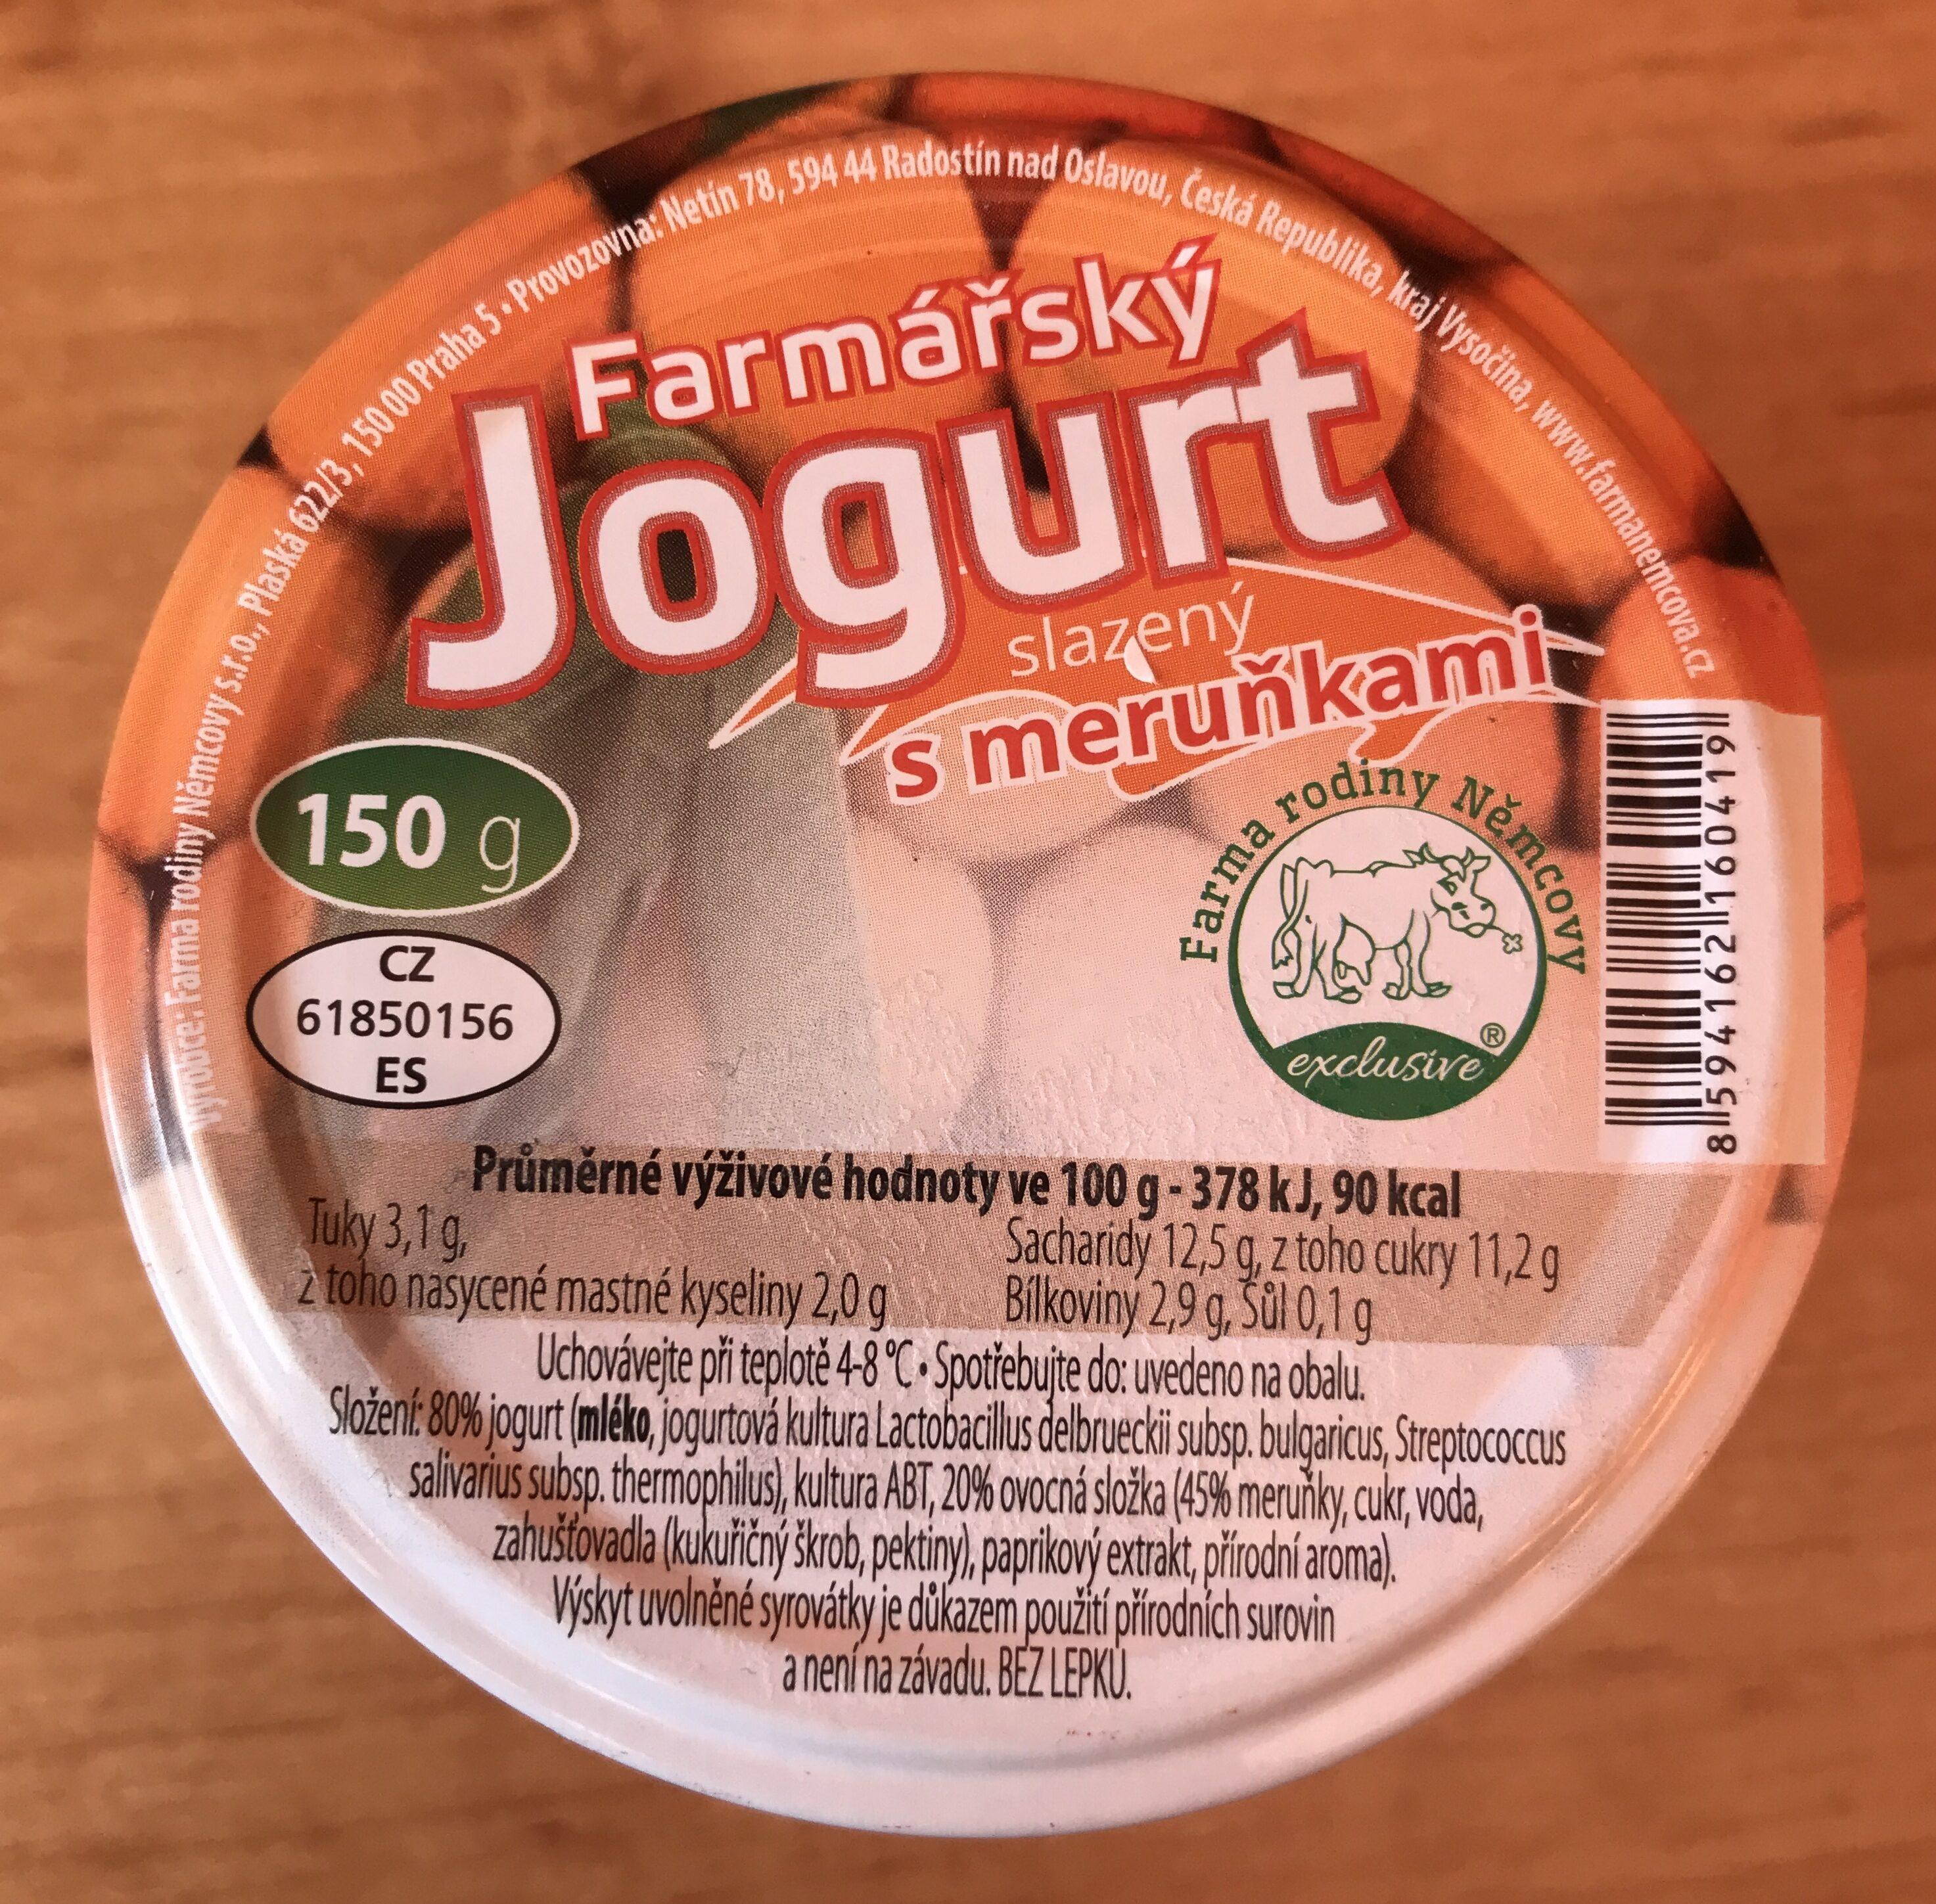 Farmářský jogurt slazený s meruňkami - Product - cs